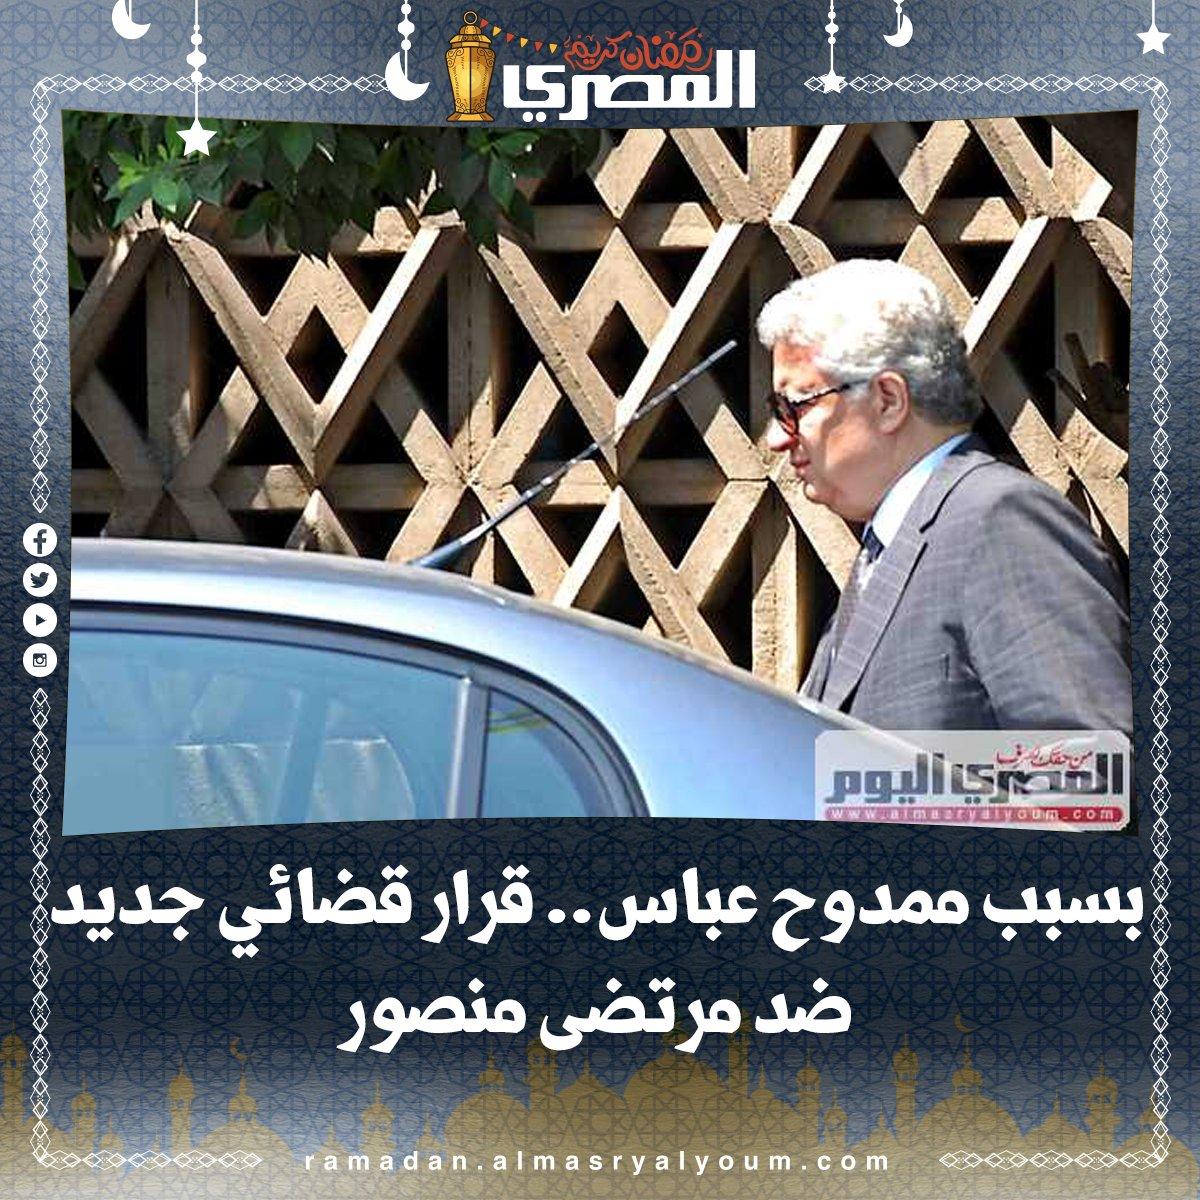 بسبب ممدوح عباس.. قرار قضائي جديد ضد مرتضى منصور